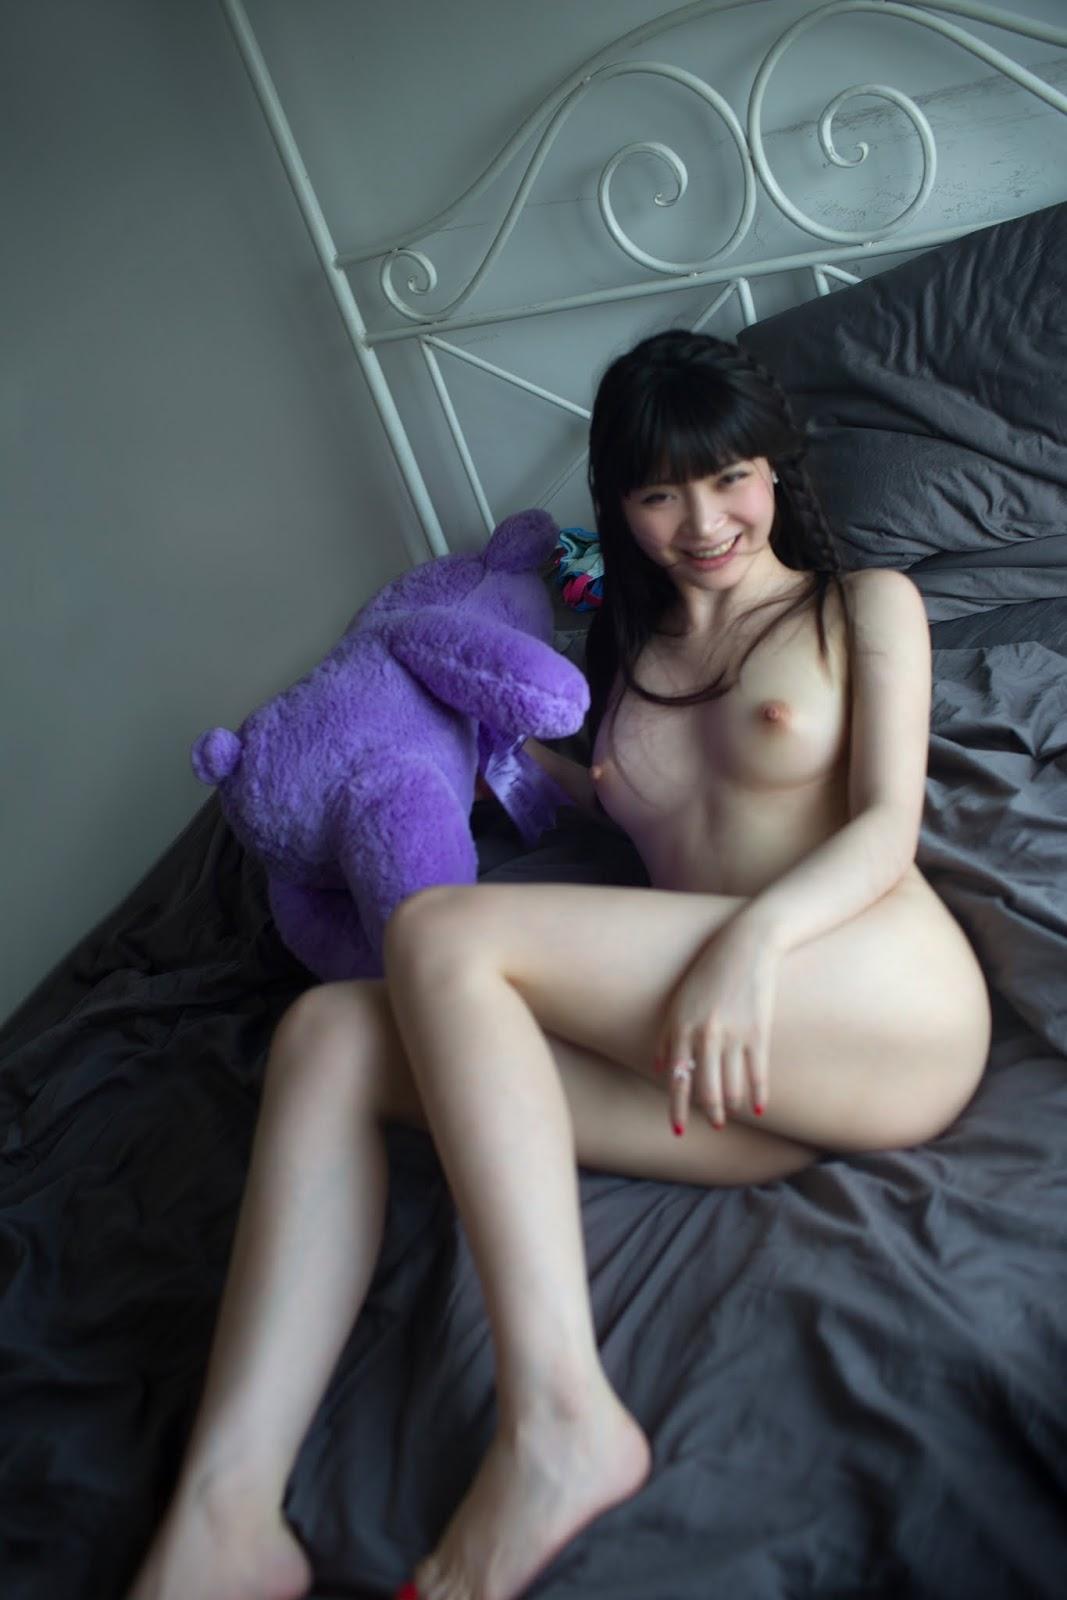 Www. gravure girlz big boobs photos would love